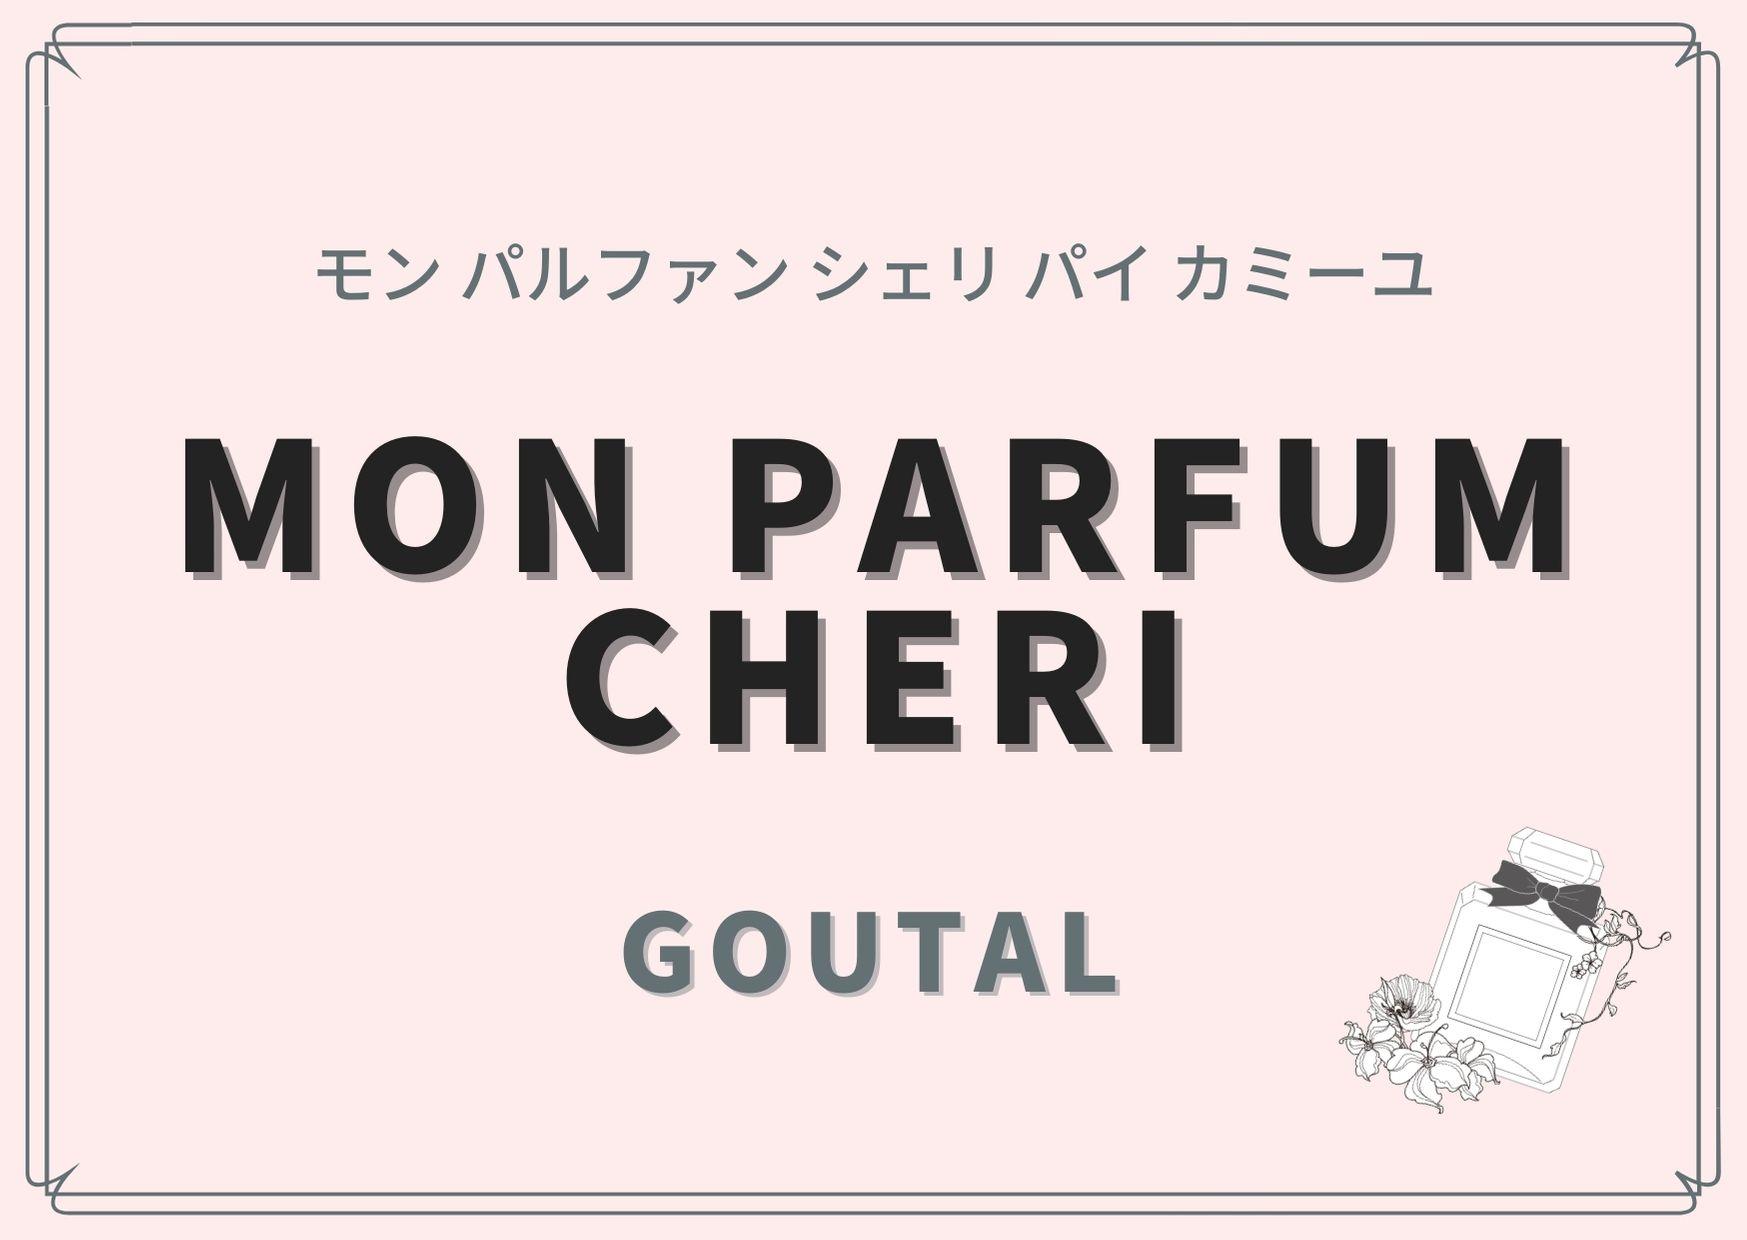 MON PARFUM CHERI(モン パルファン シェリ パイ カミーユ)/ANNICK GOUTAL(アニック グタール)